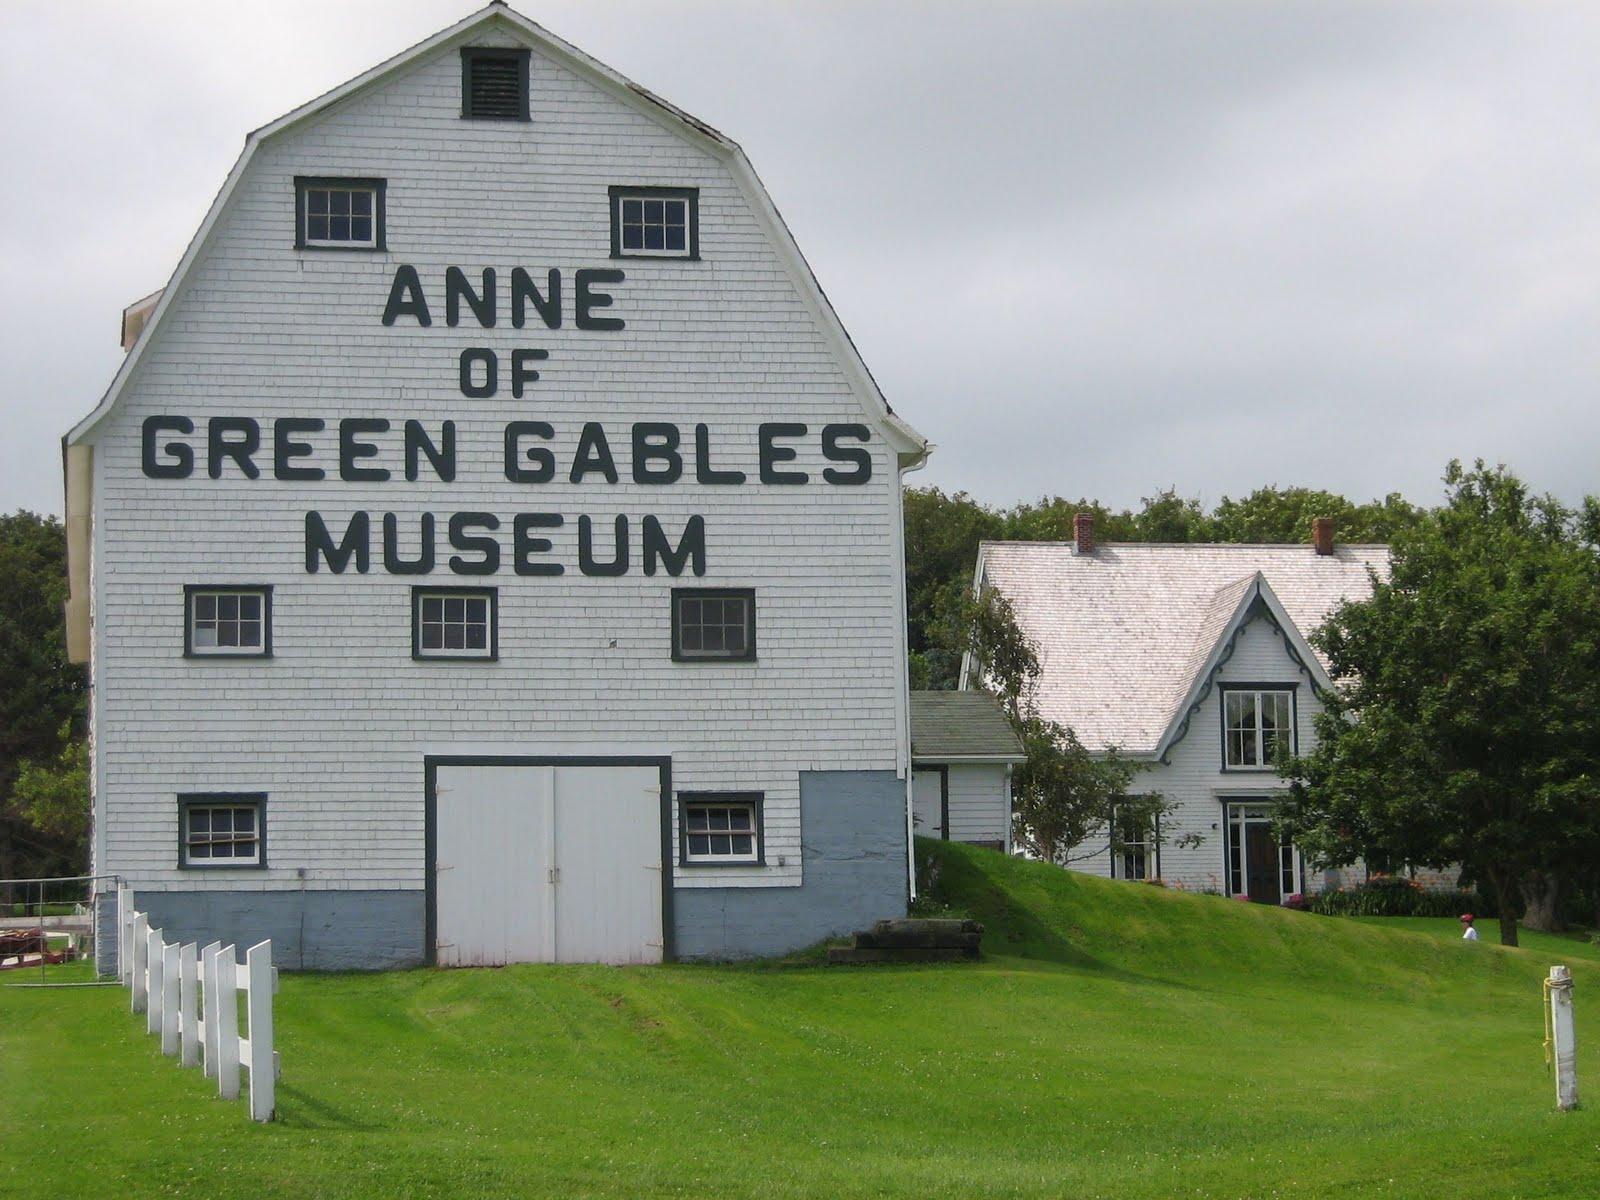 Blog Of Green Gables Anne Of Green Gables Museum